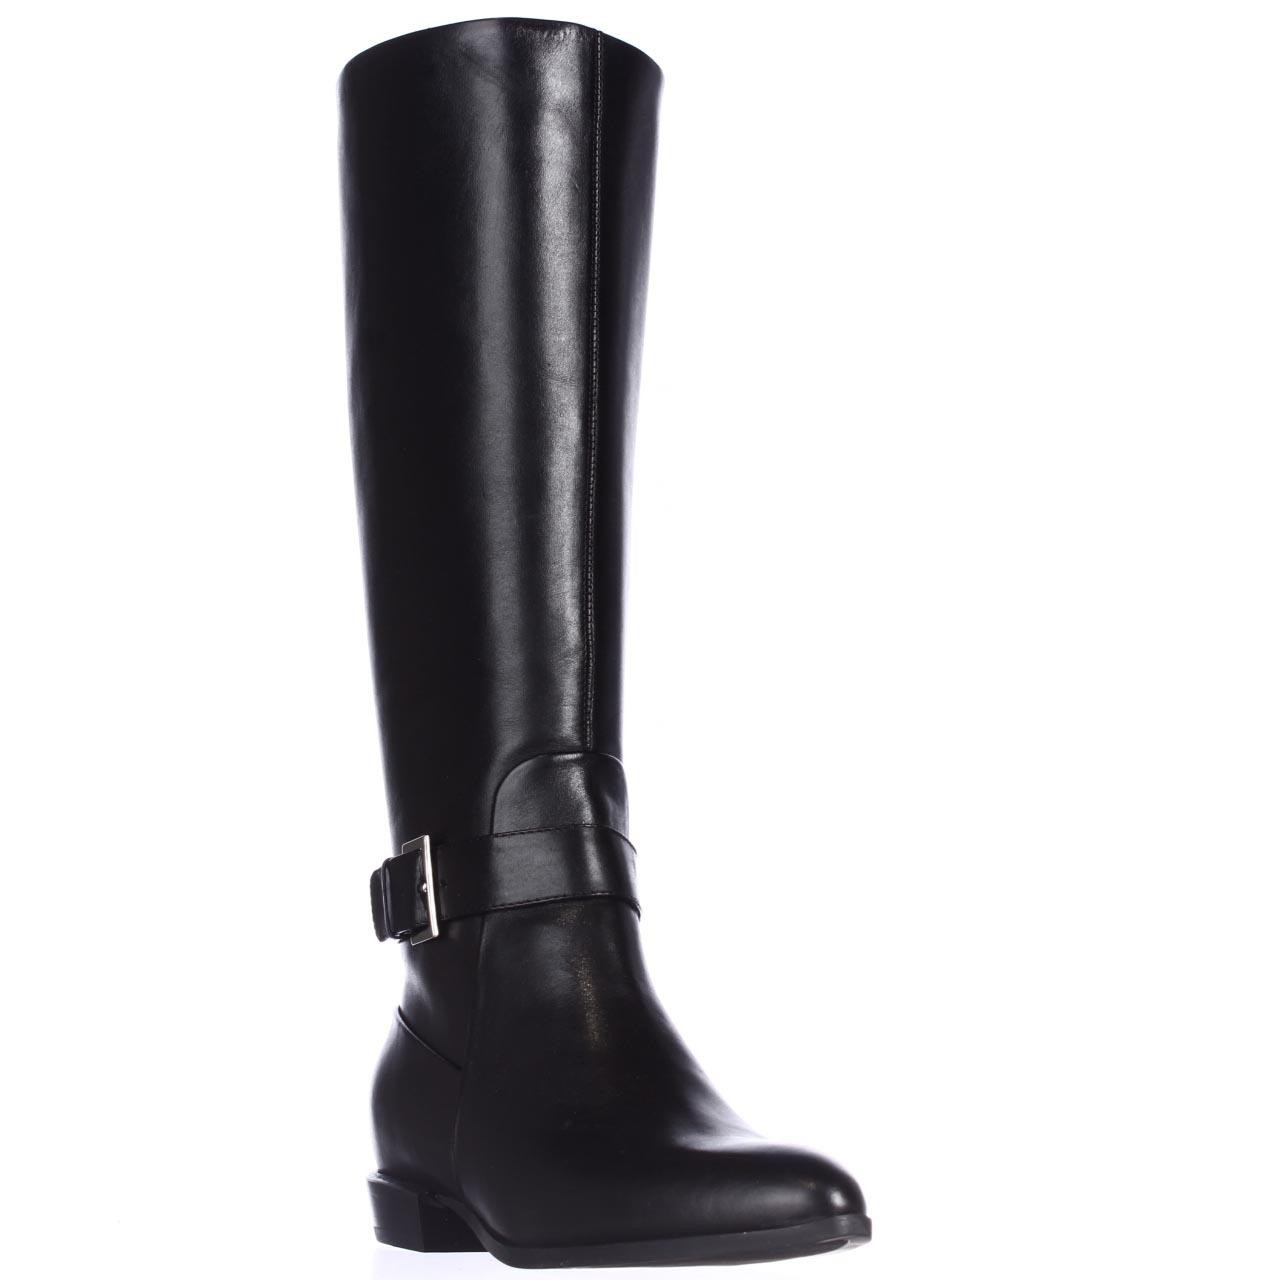 nine west diablo knee high pointed toe boots in black lyst